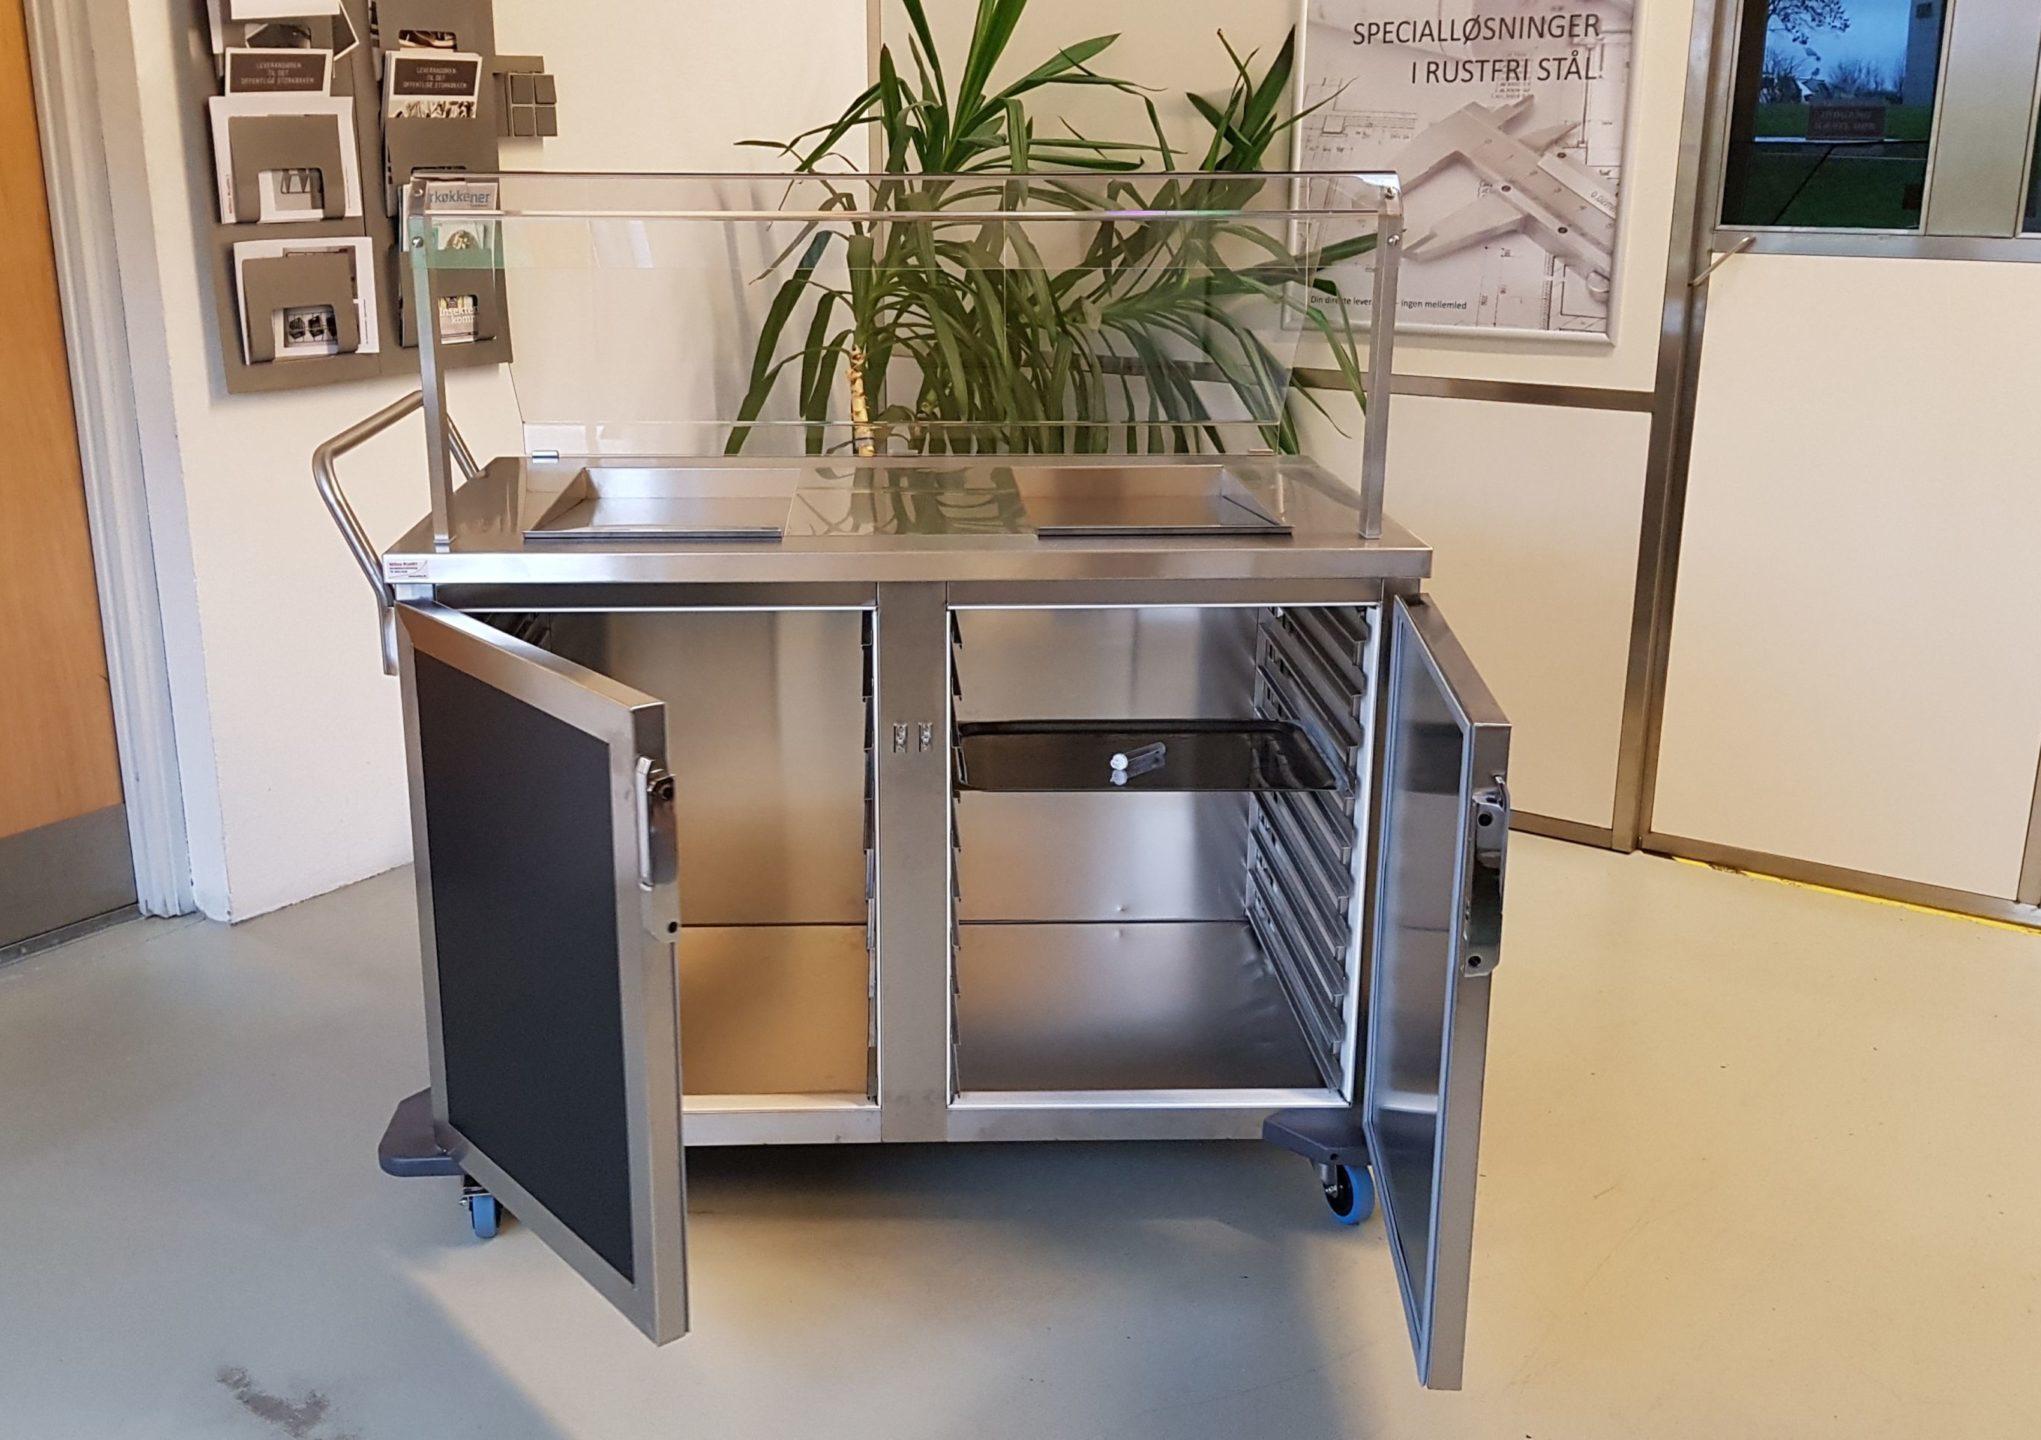 Wilno Rustfri ApS - Serveringsvogn / salgsvogn